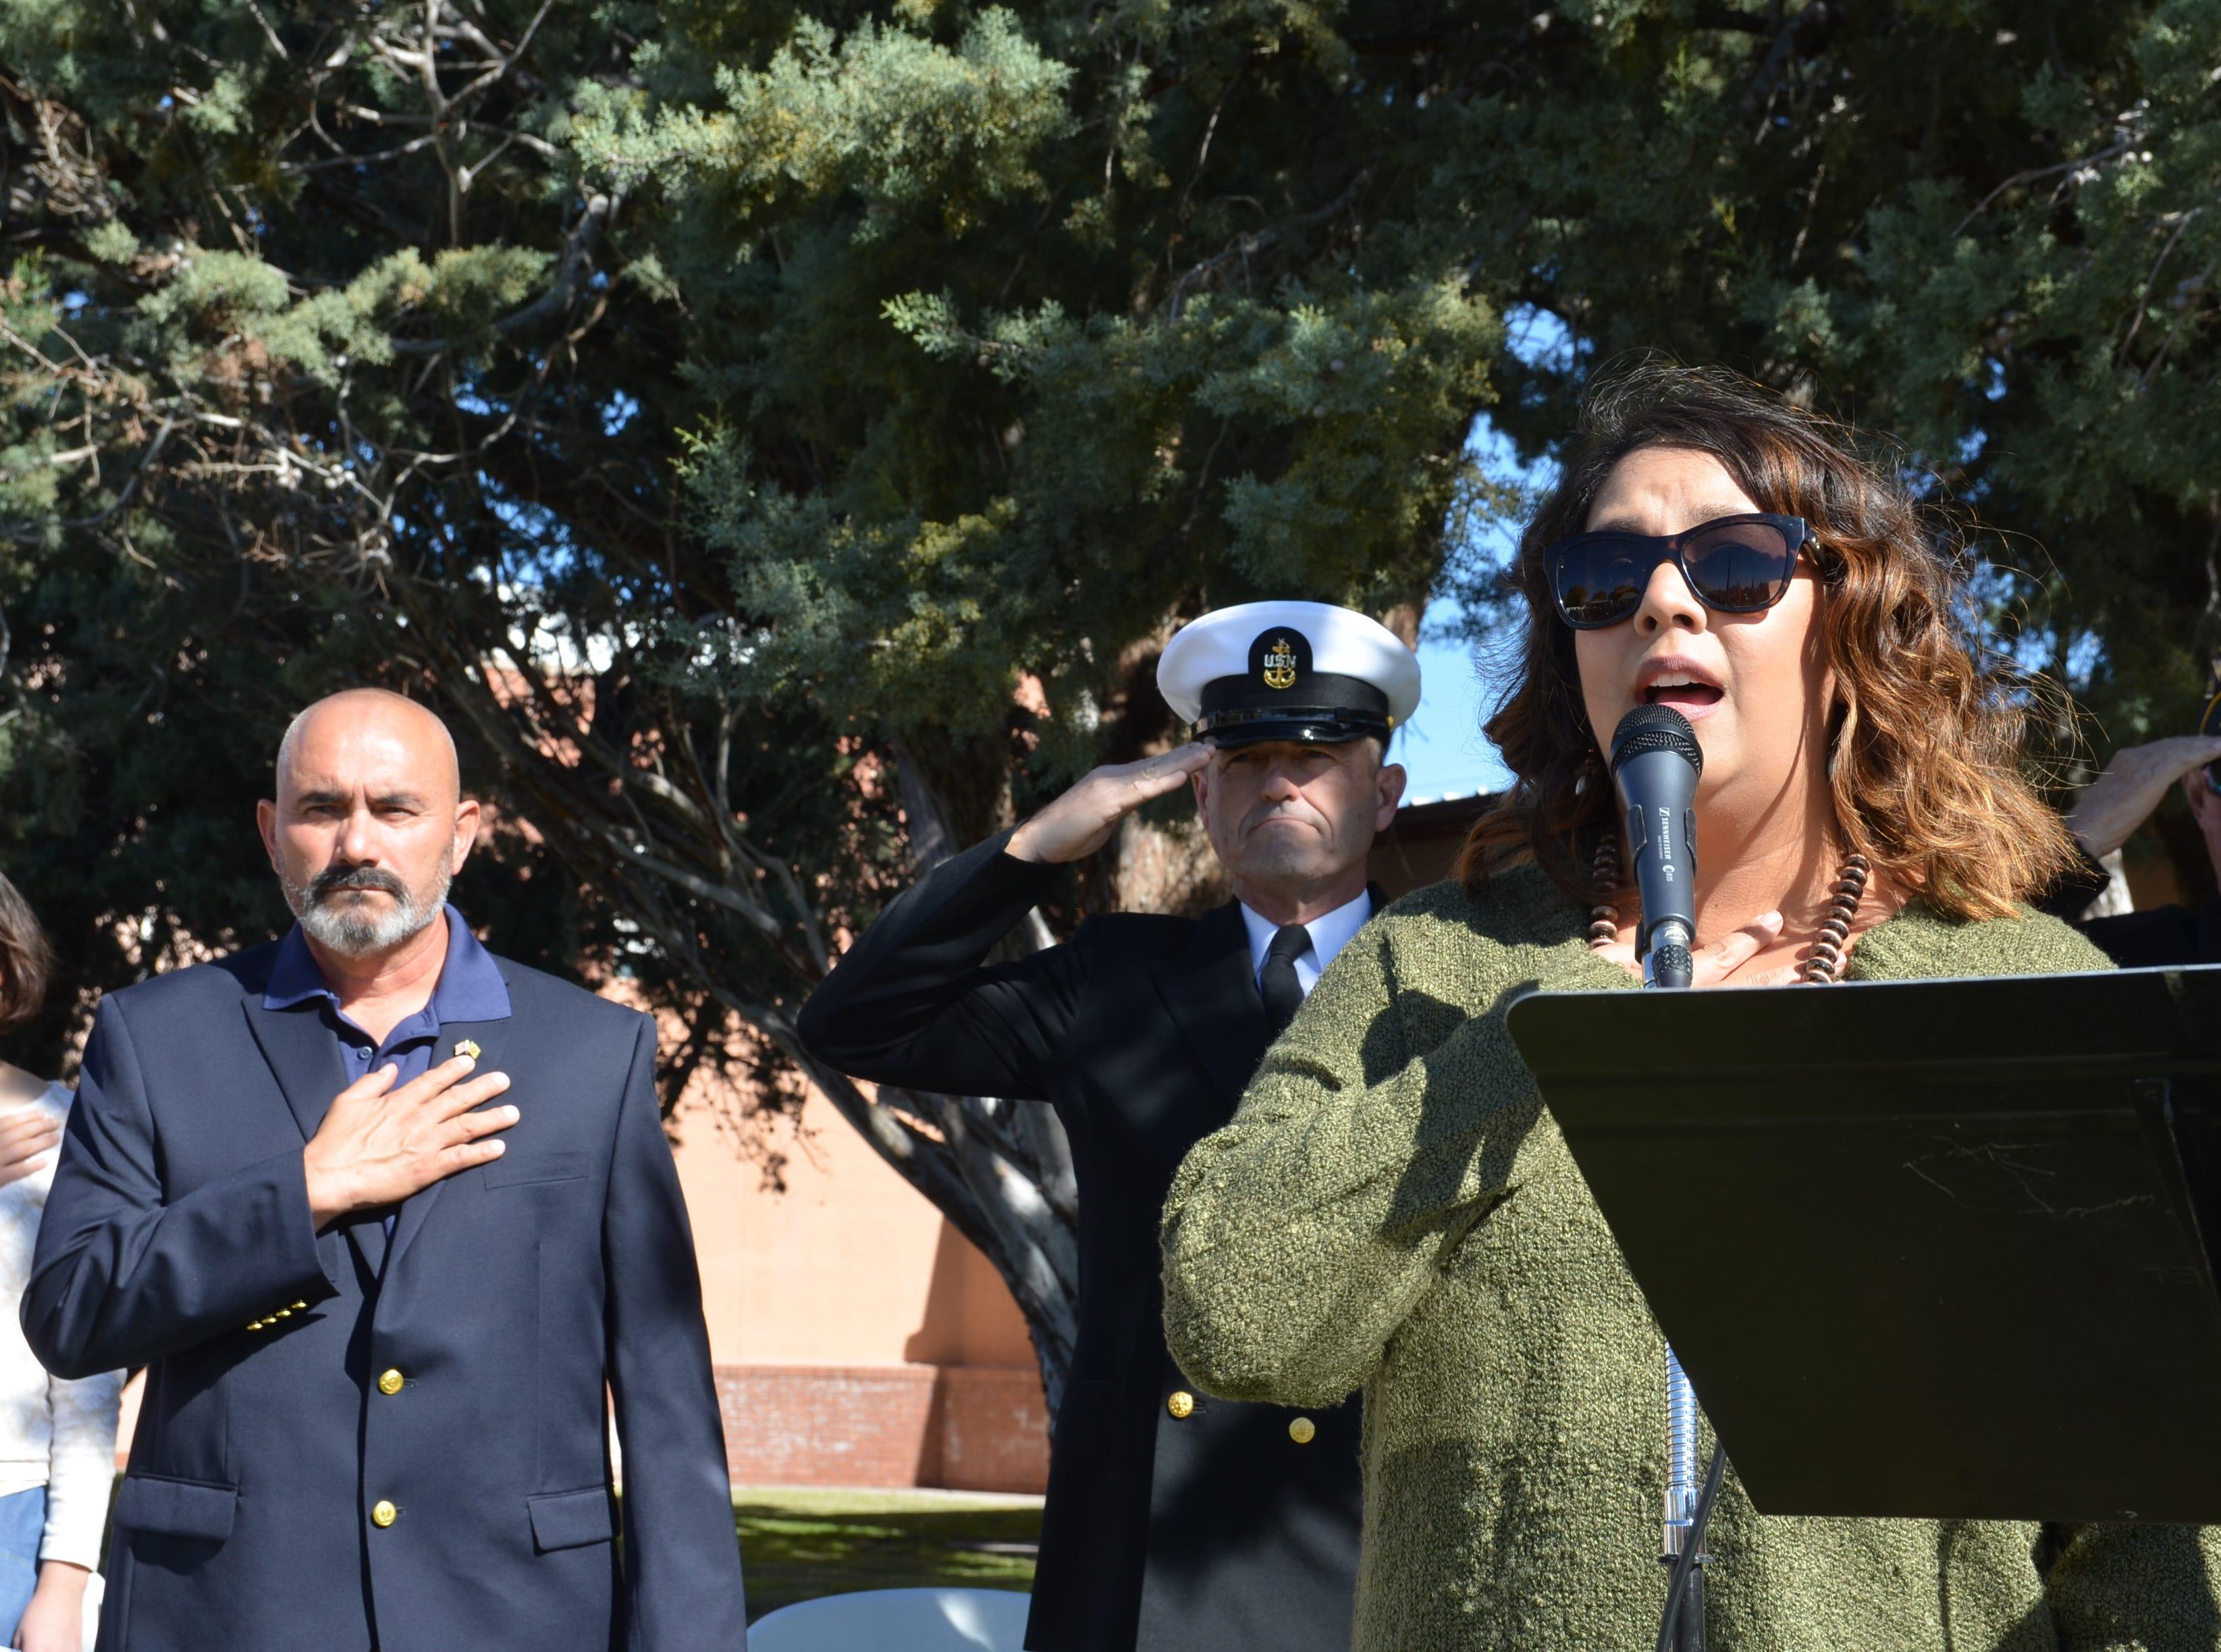 Performer Jessica Juarez Rios sang the National Anthem